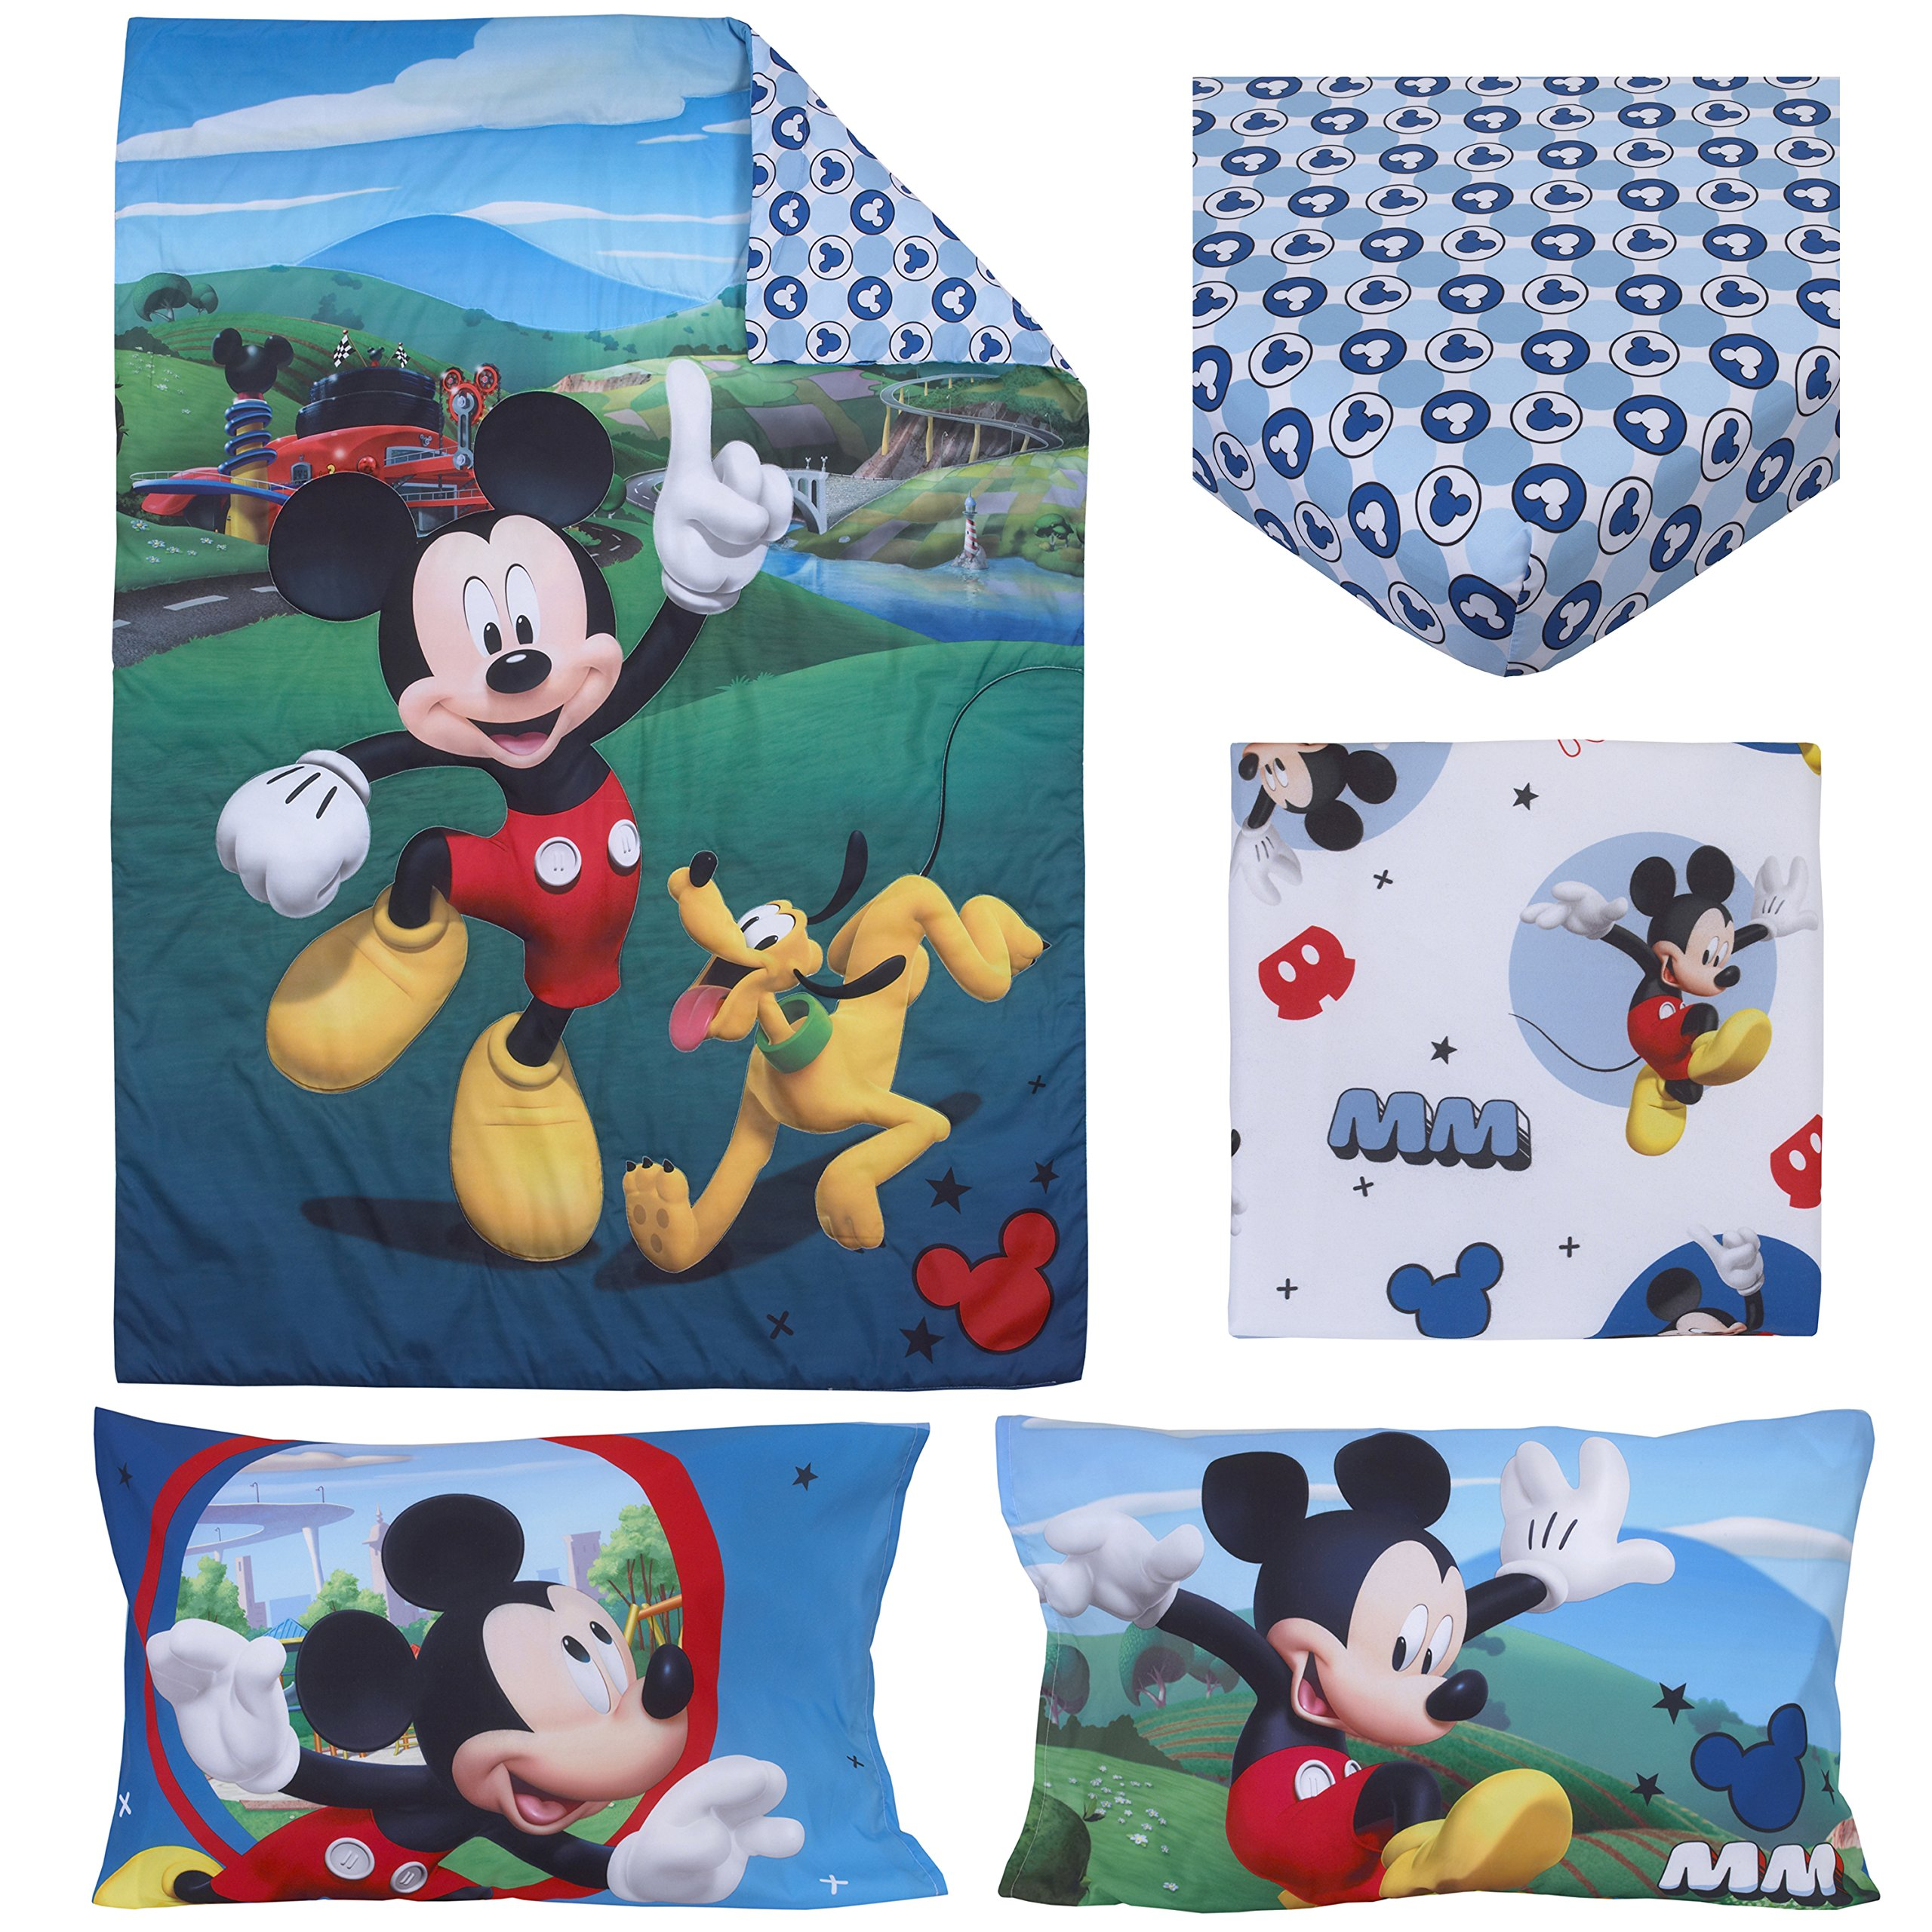 Disney 4 Piece Toddler Bedding Set, Mickey Mouse Playhouse, Blue/White, Standard Toddler Mattress (52'' x 28'' x 8'')